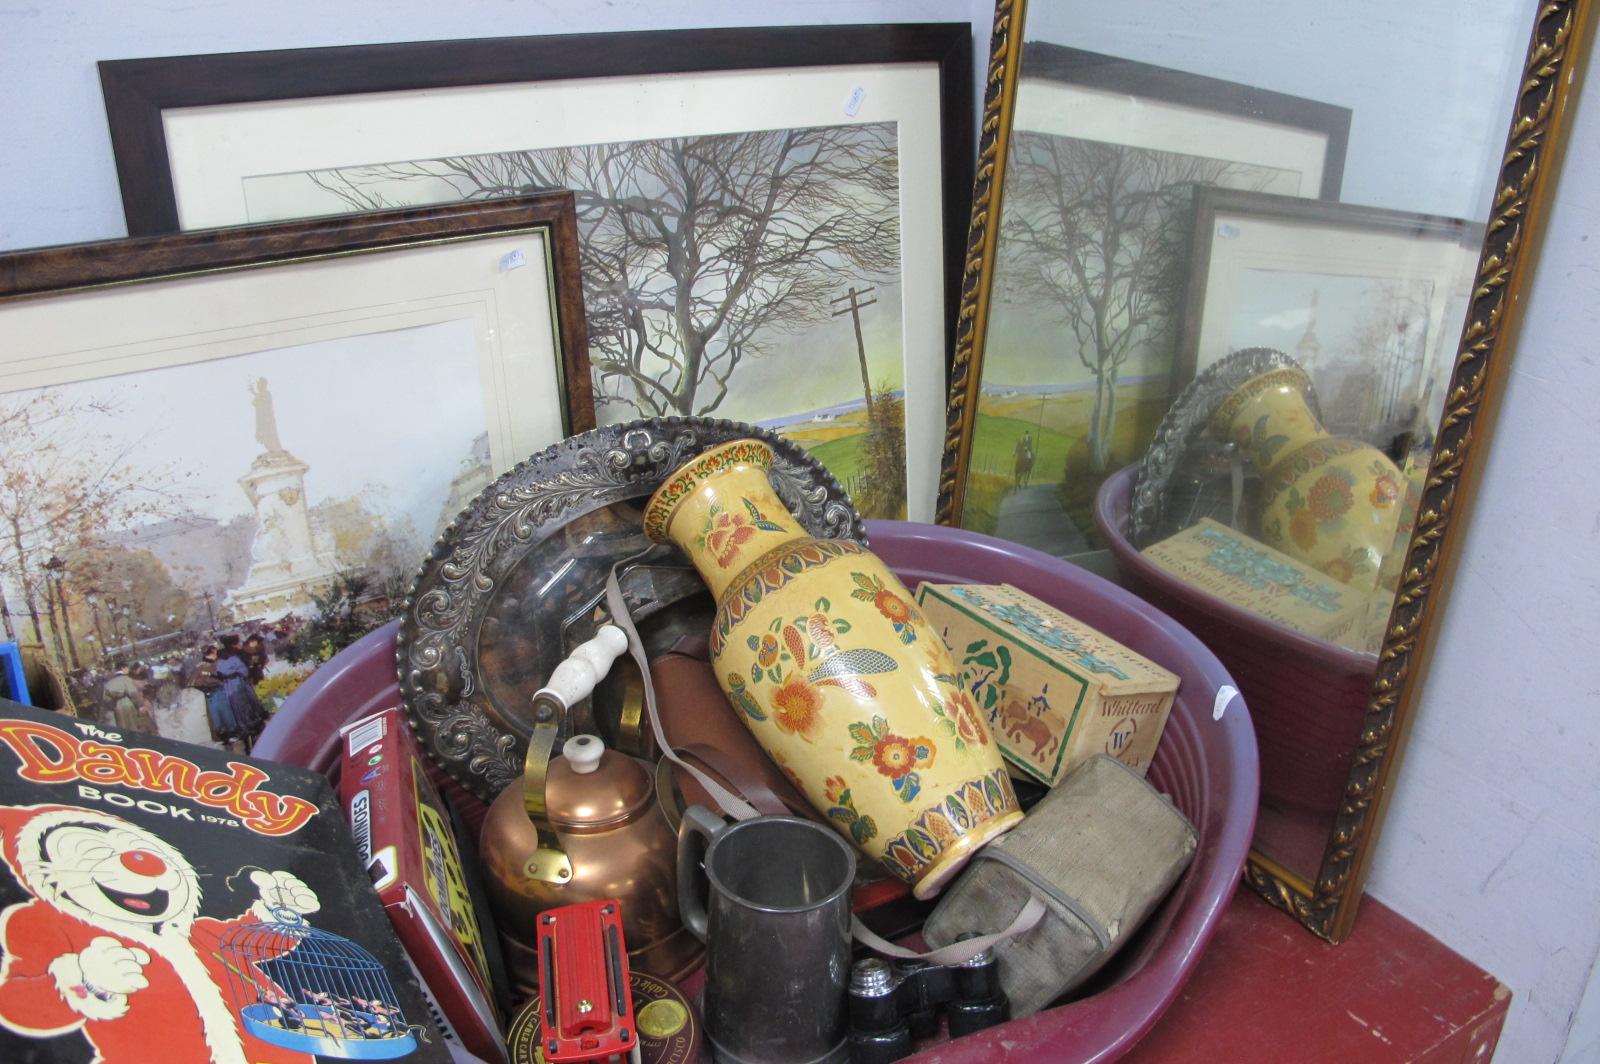 Mirror, three prints, camera's, copper kettle, dominoes, etc.